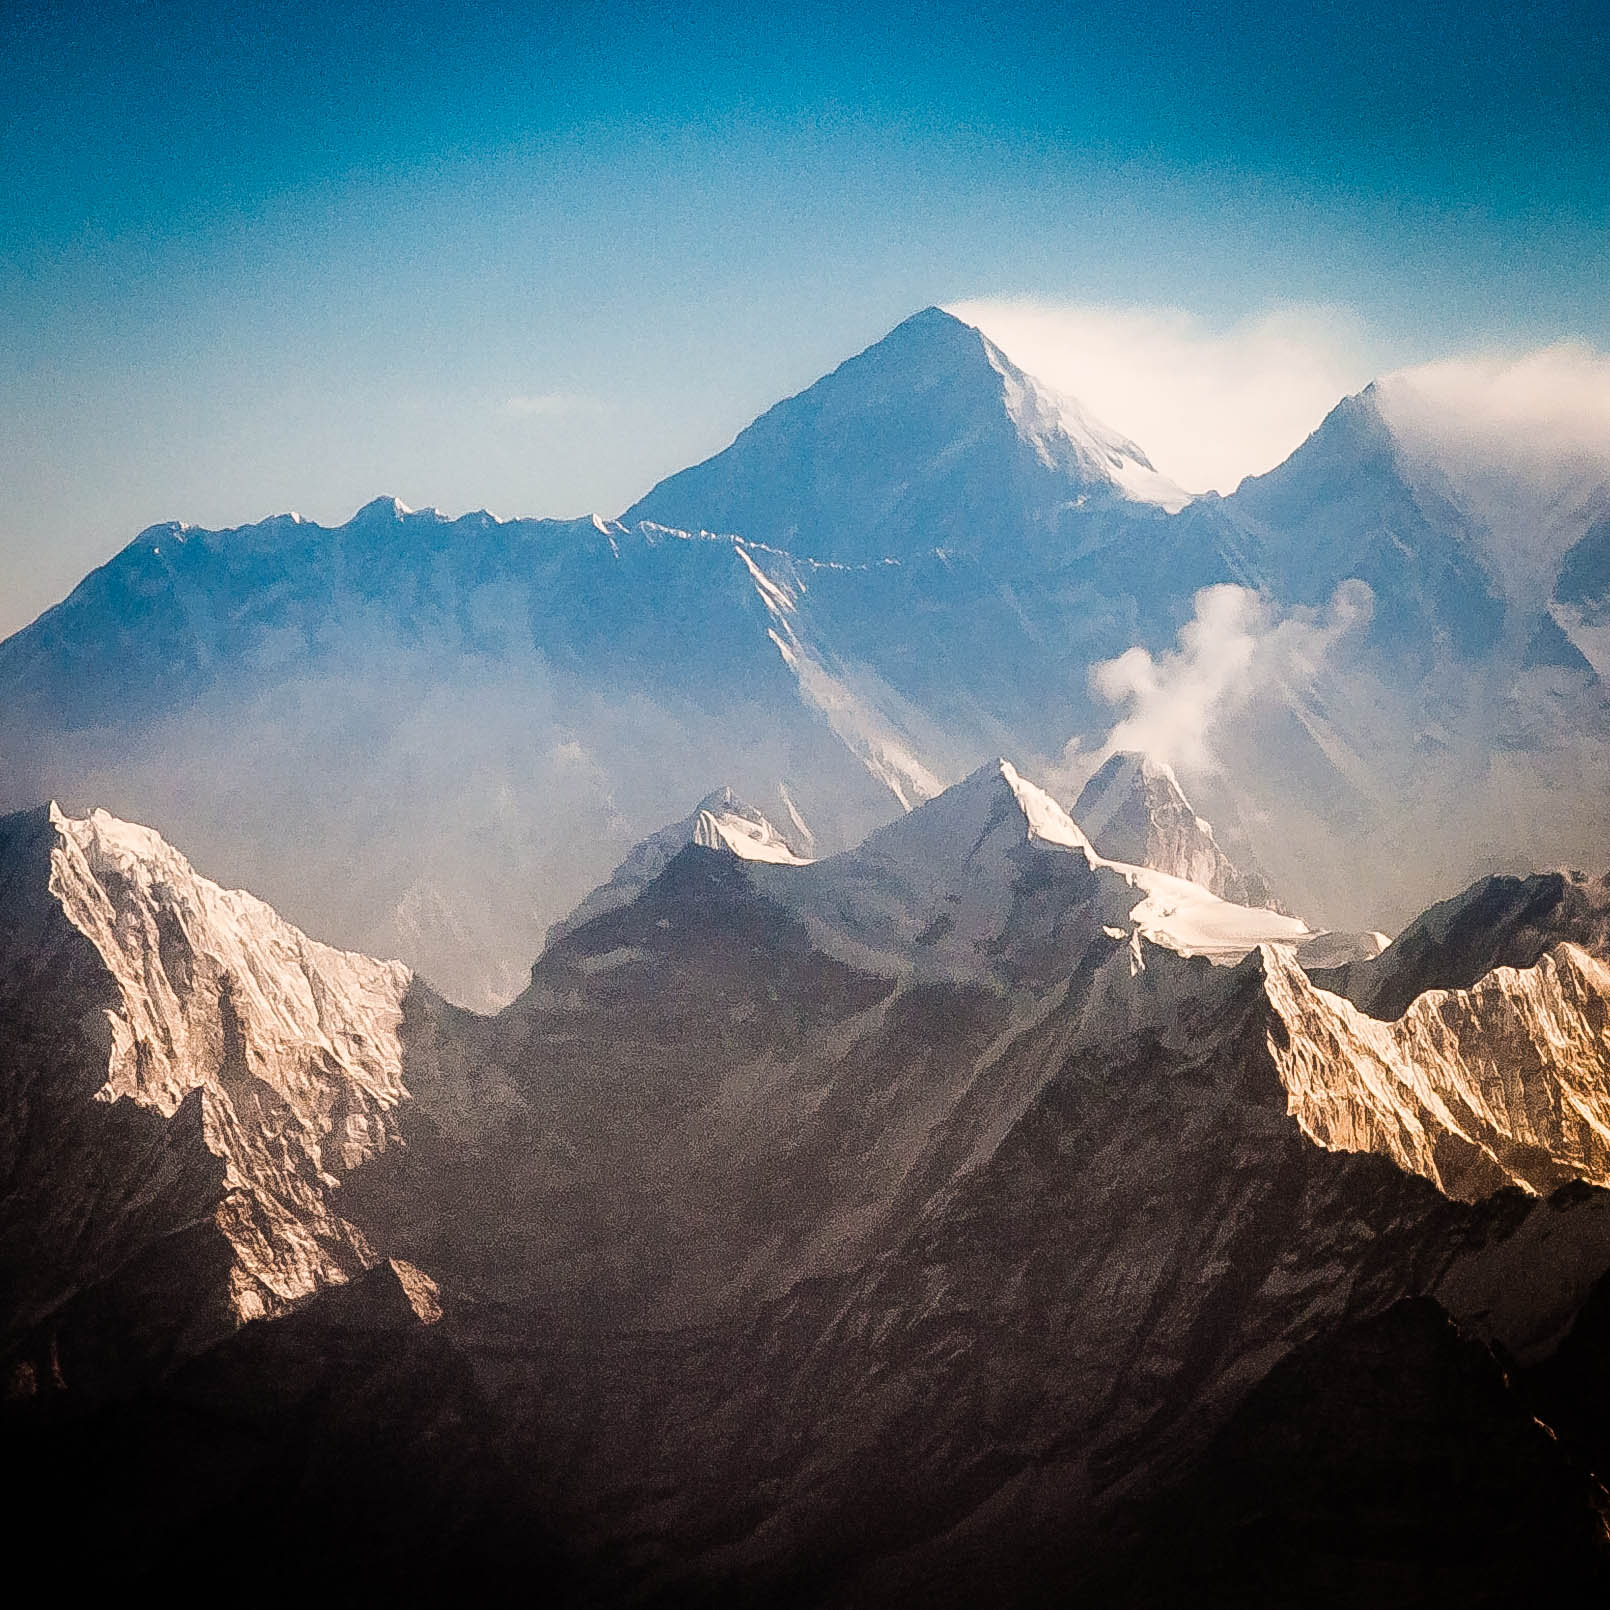 Mt. Everest, Lhotse, Nuptse